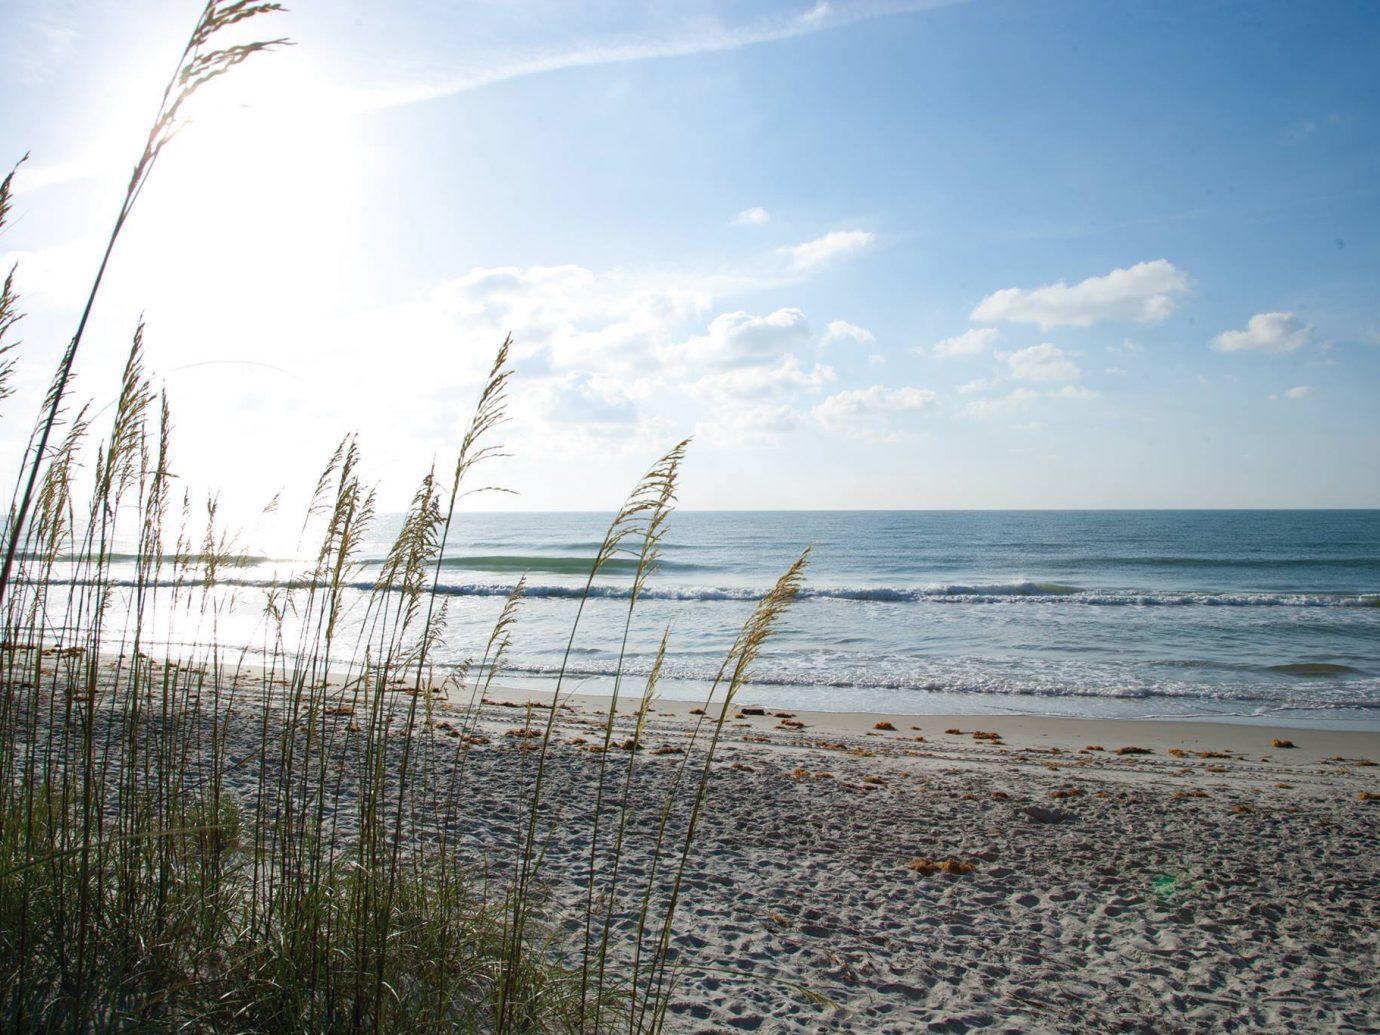 sky outdoor habitat shore Beach Sea body of water horizon water Ocean Coast cloud wave morning Nature sunlight sand reflection wind